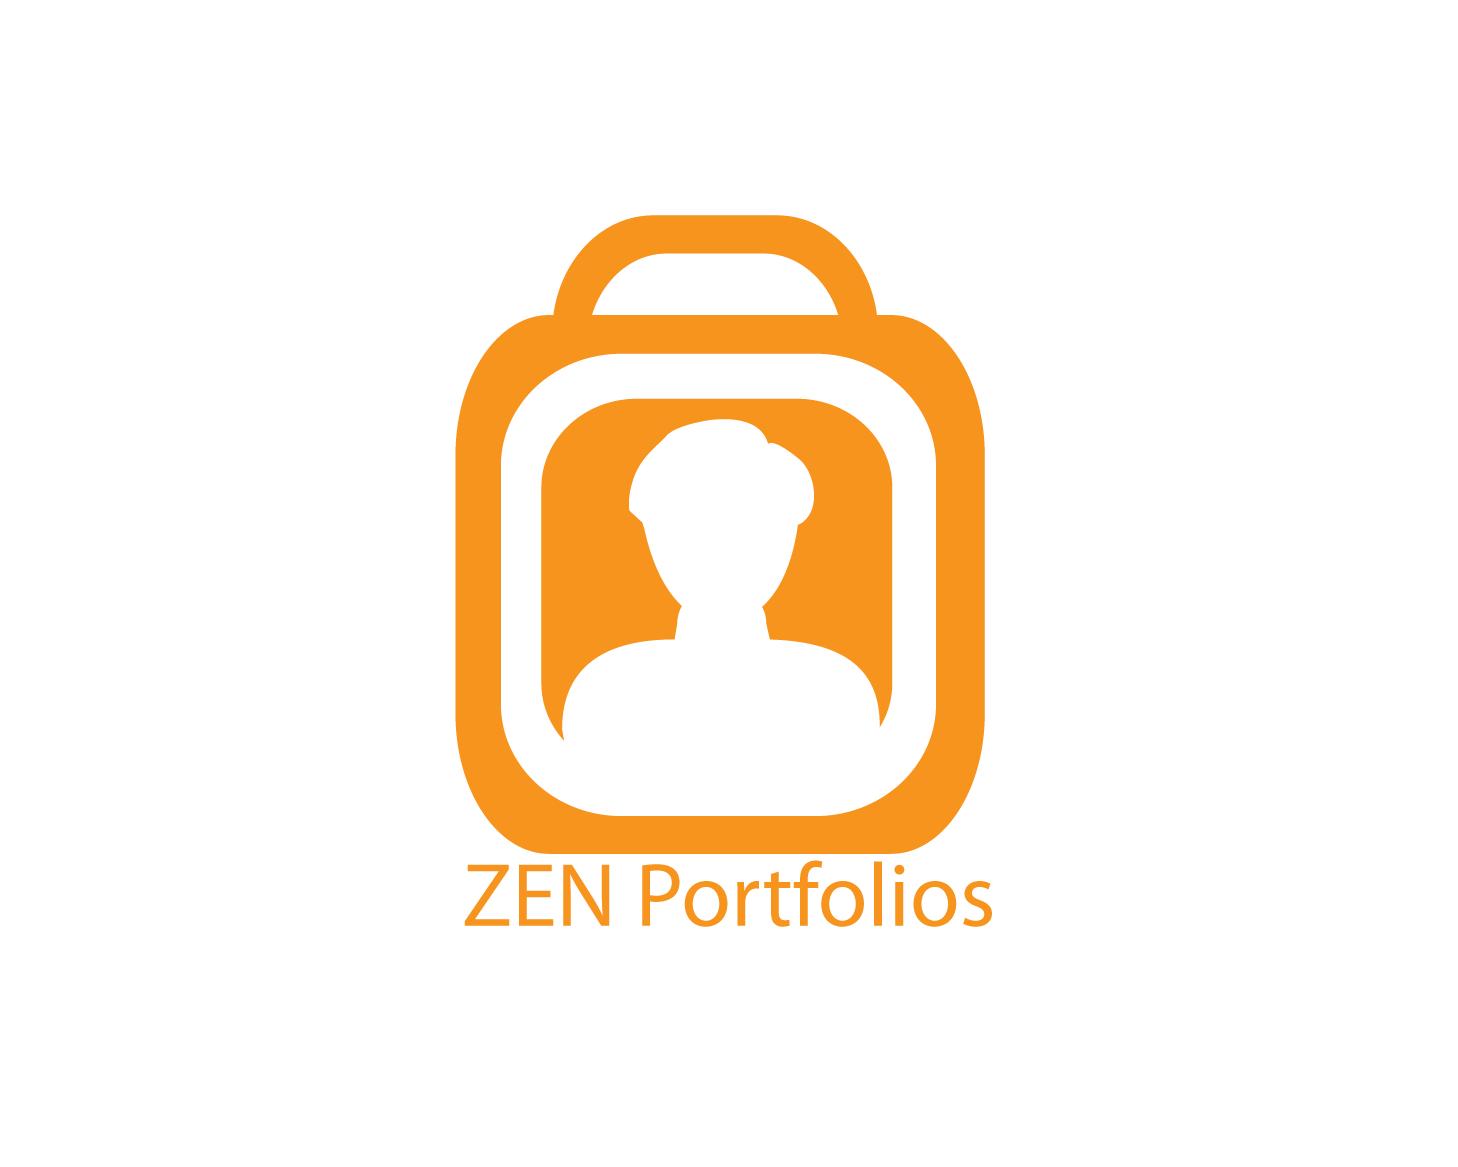 Logo Design by Roy Ferre - Entry No. 52 in the Logo Design Contest New Logo Design for ZEN Portfolios.